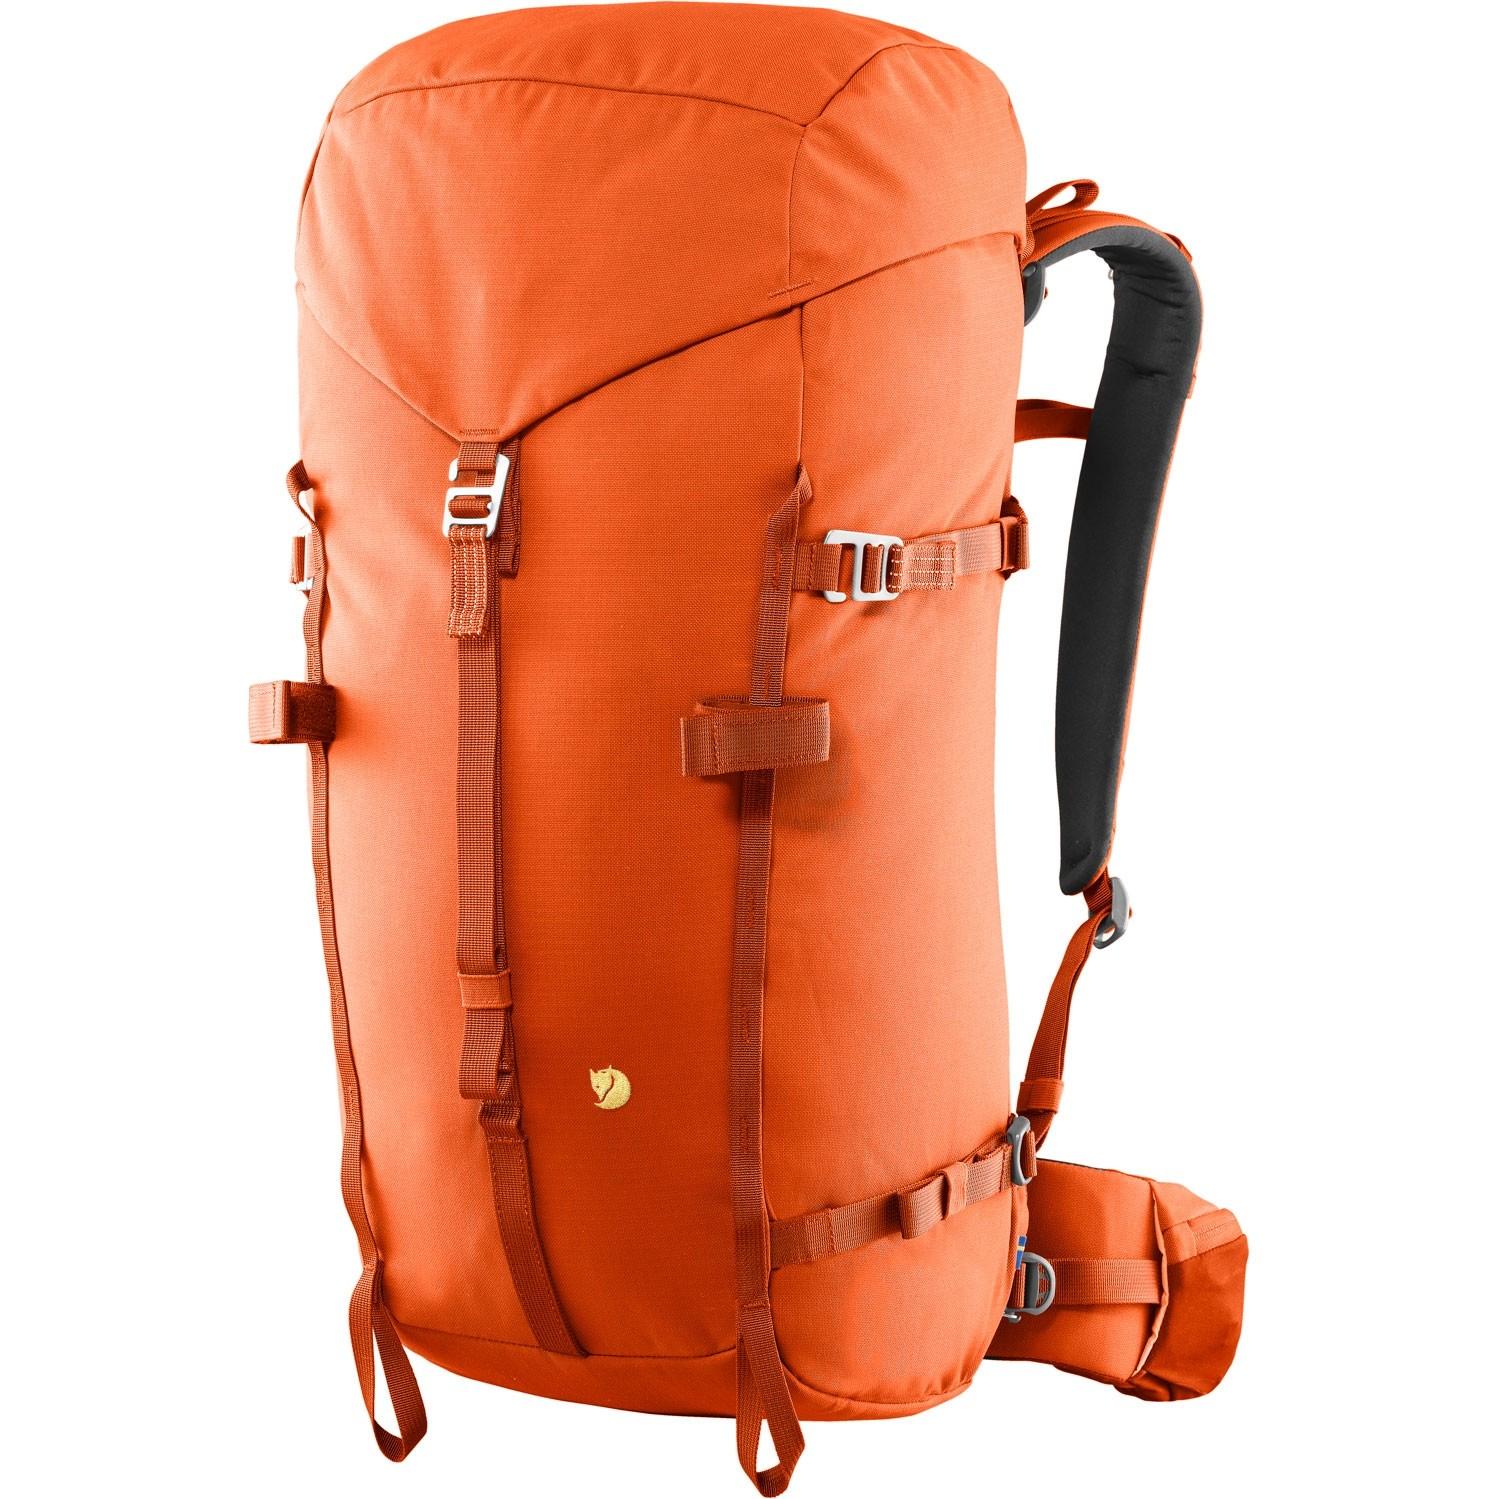 Fjallraven Bergtagen 38 Rucksack - Hokkaido Orange